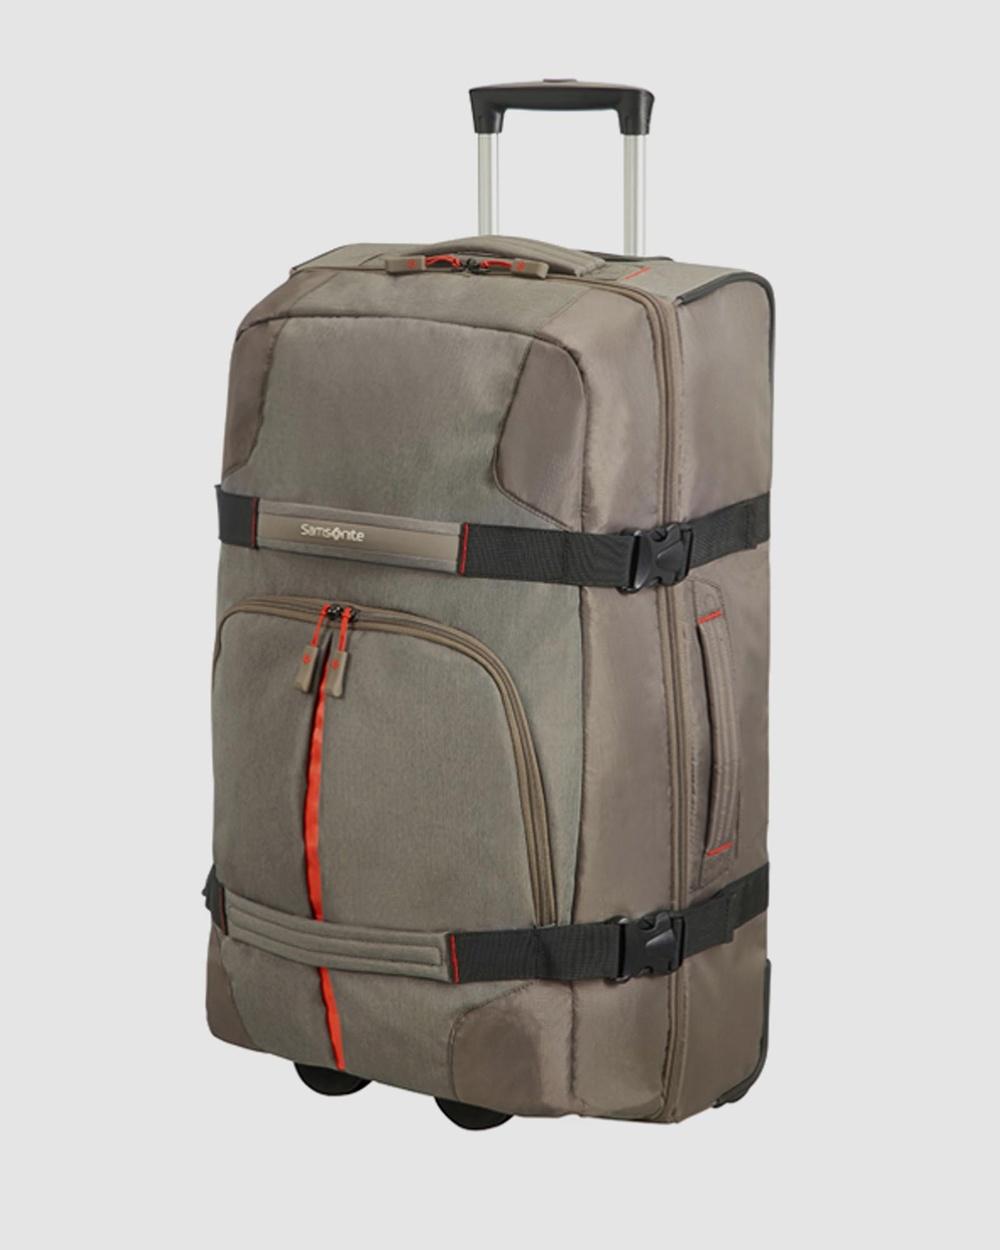 Samsonite Rewind Duffle Wheeled 68cm Bags Taupe